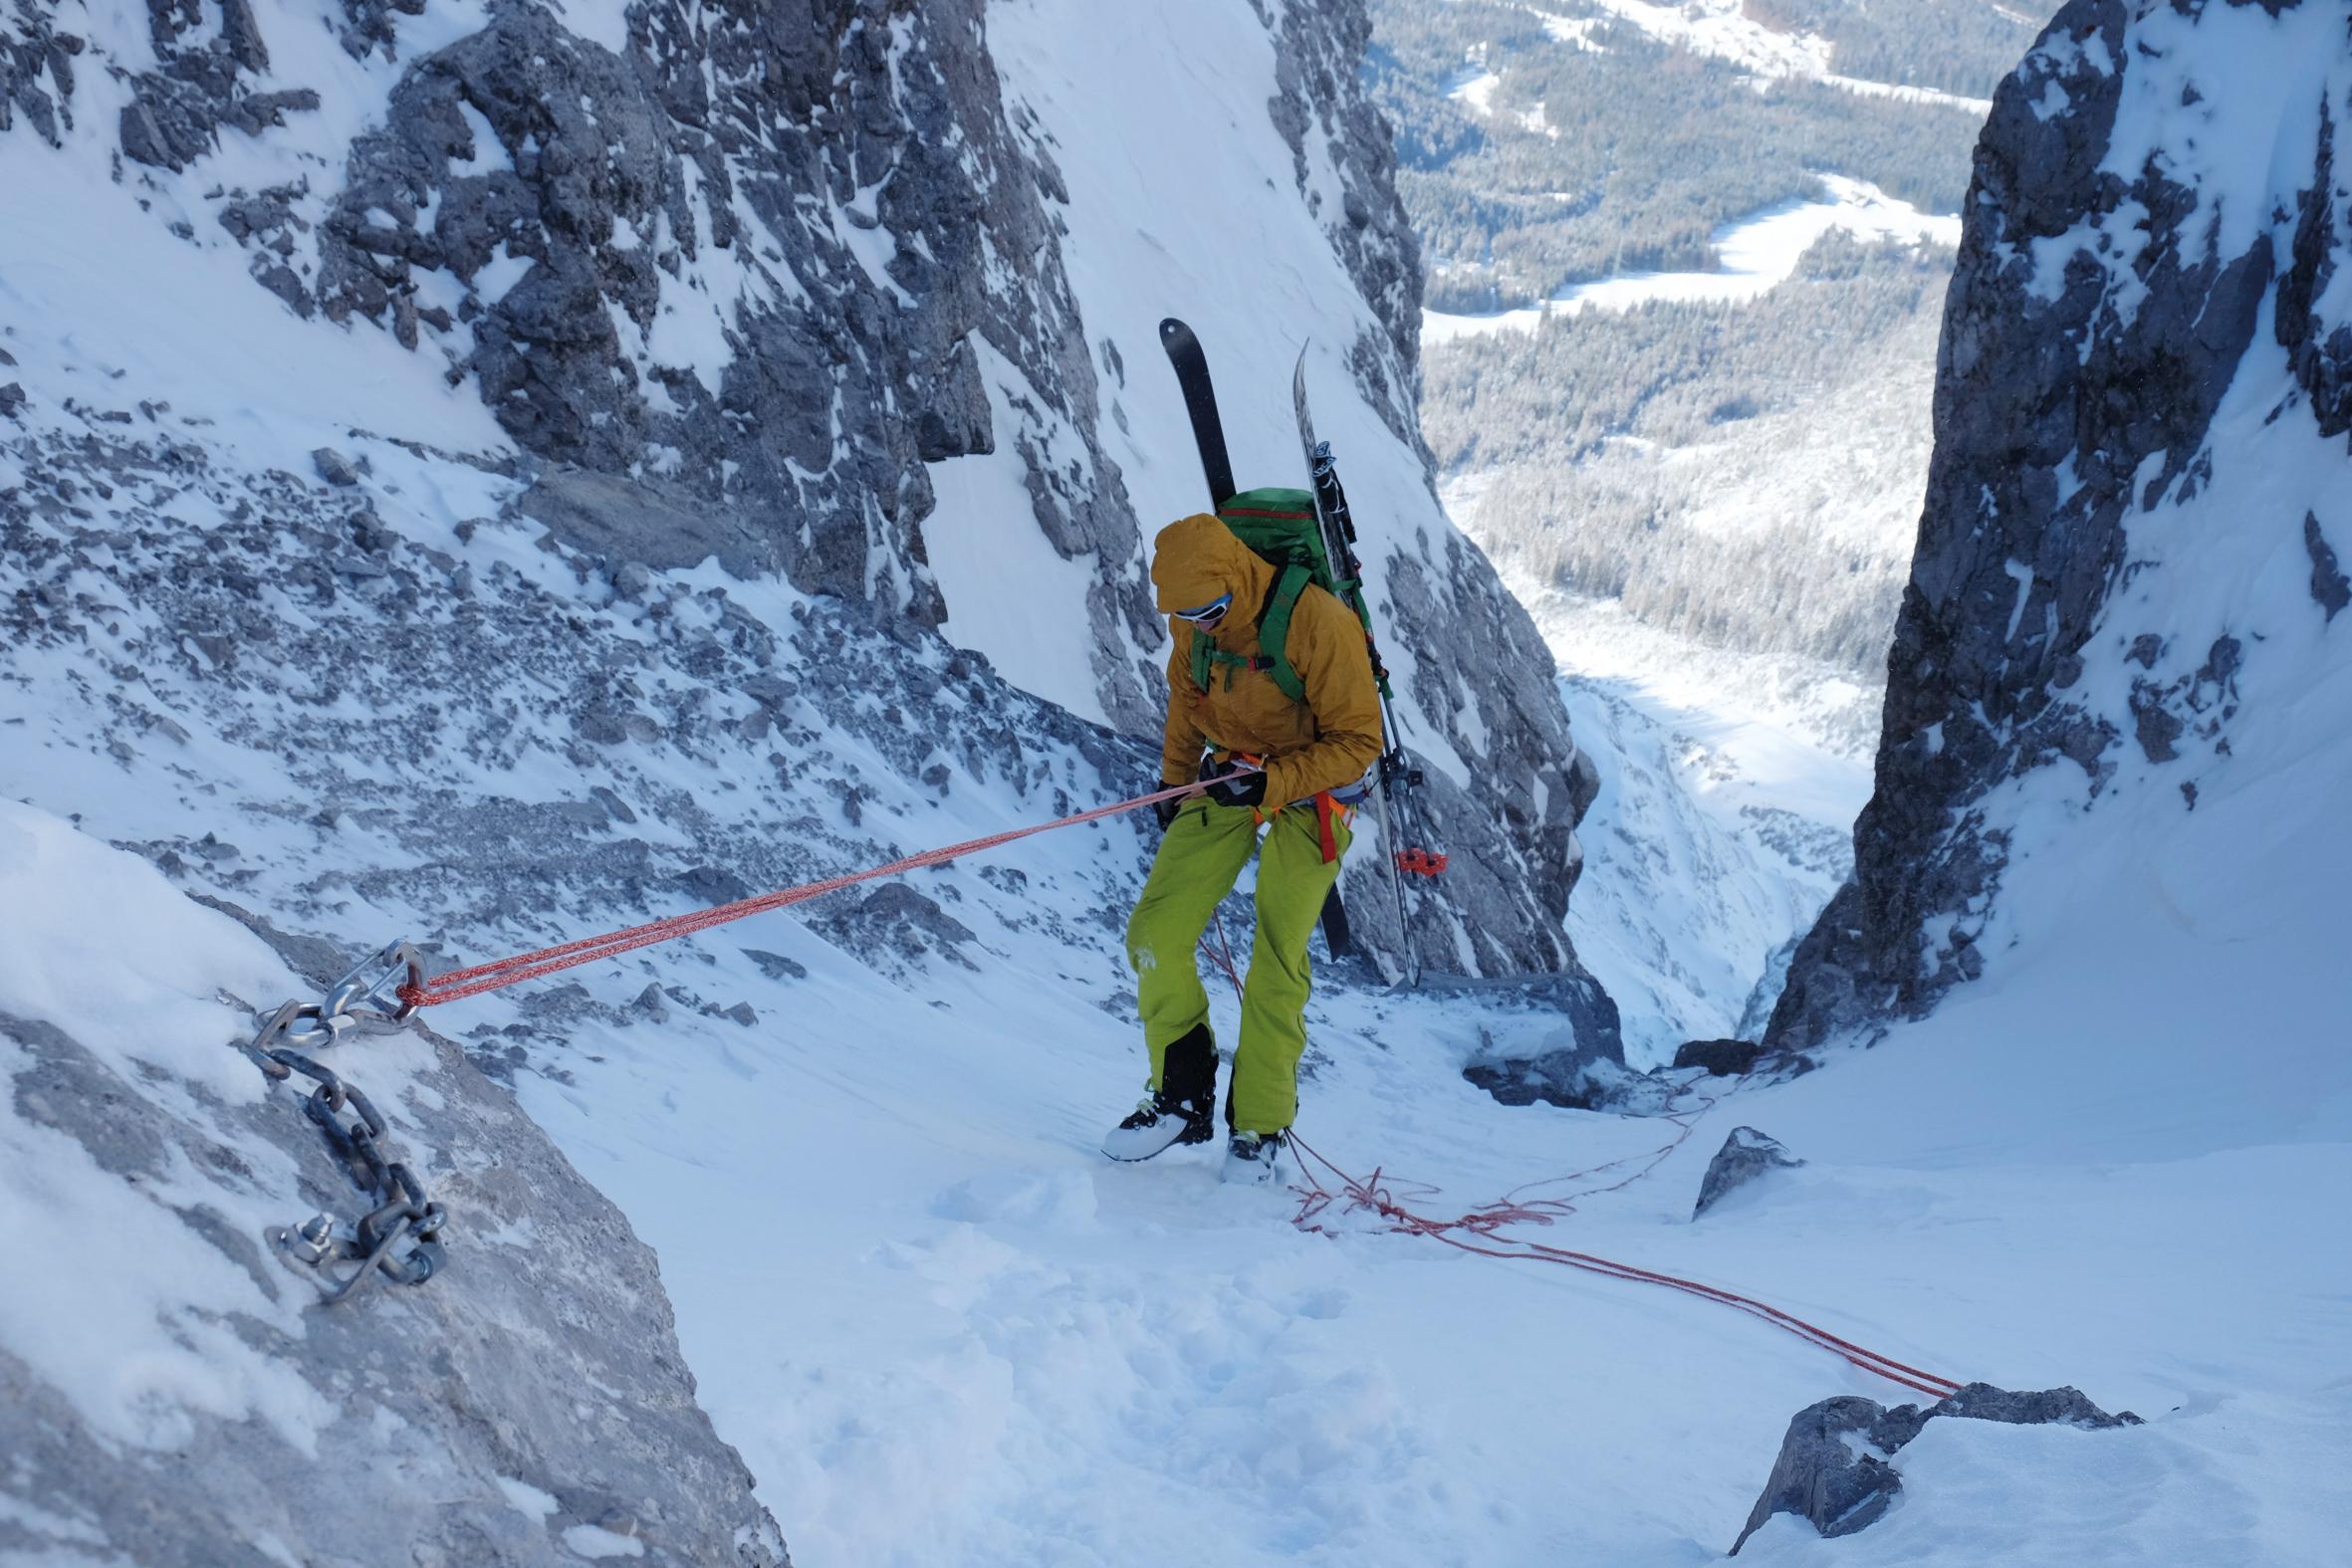 Edelrid Klettergurt Moe : Petzl corax klettergurt grau bergsport welt